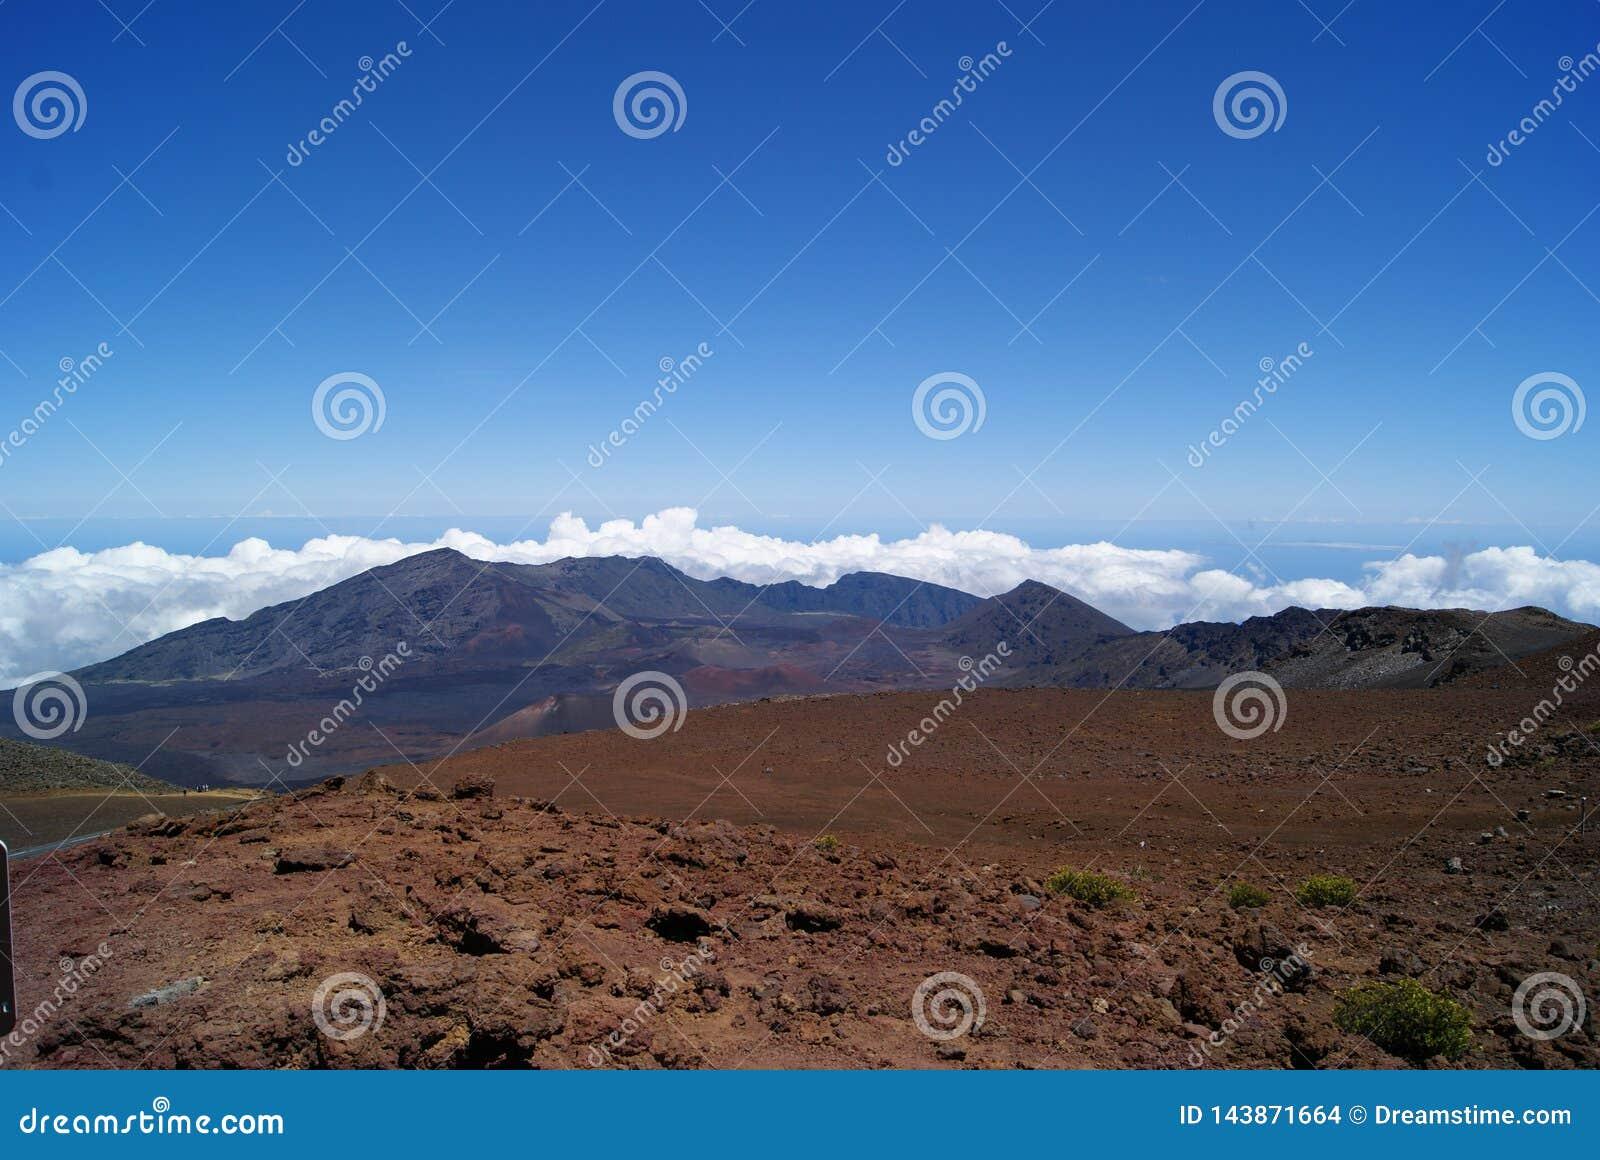 Atop of the Haleakala Volcano in Maui Hawaii